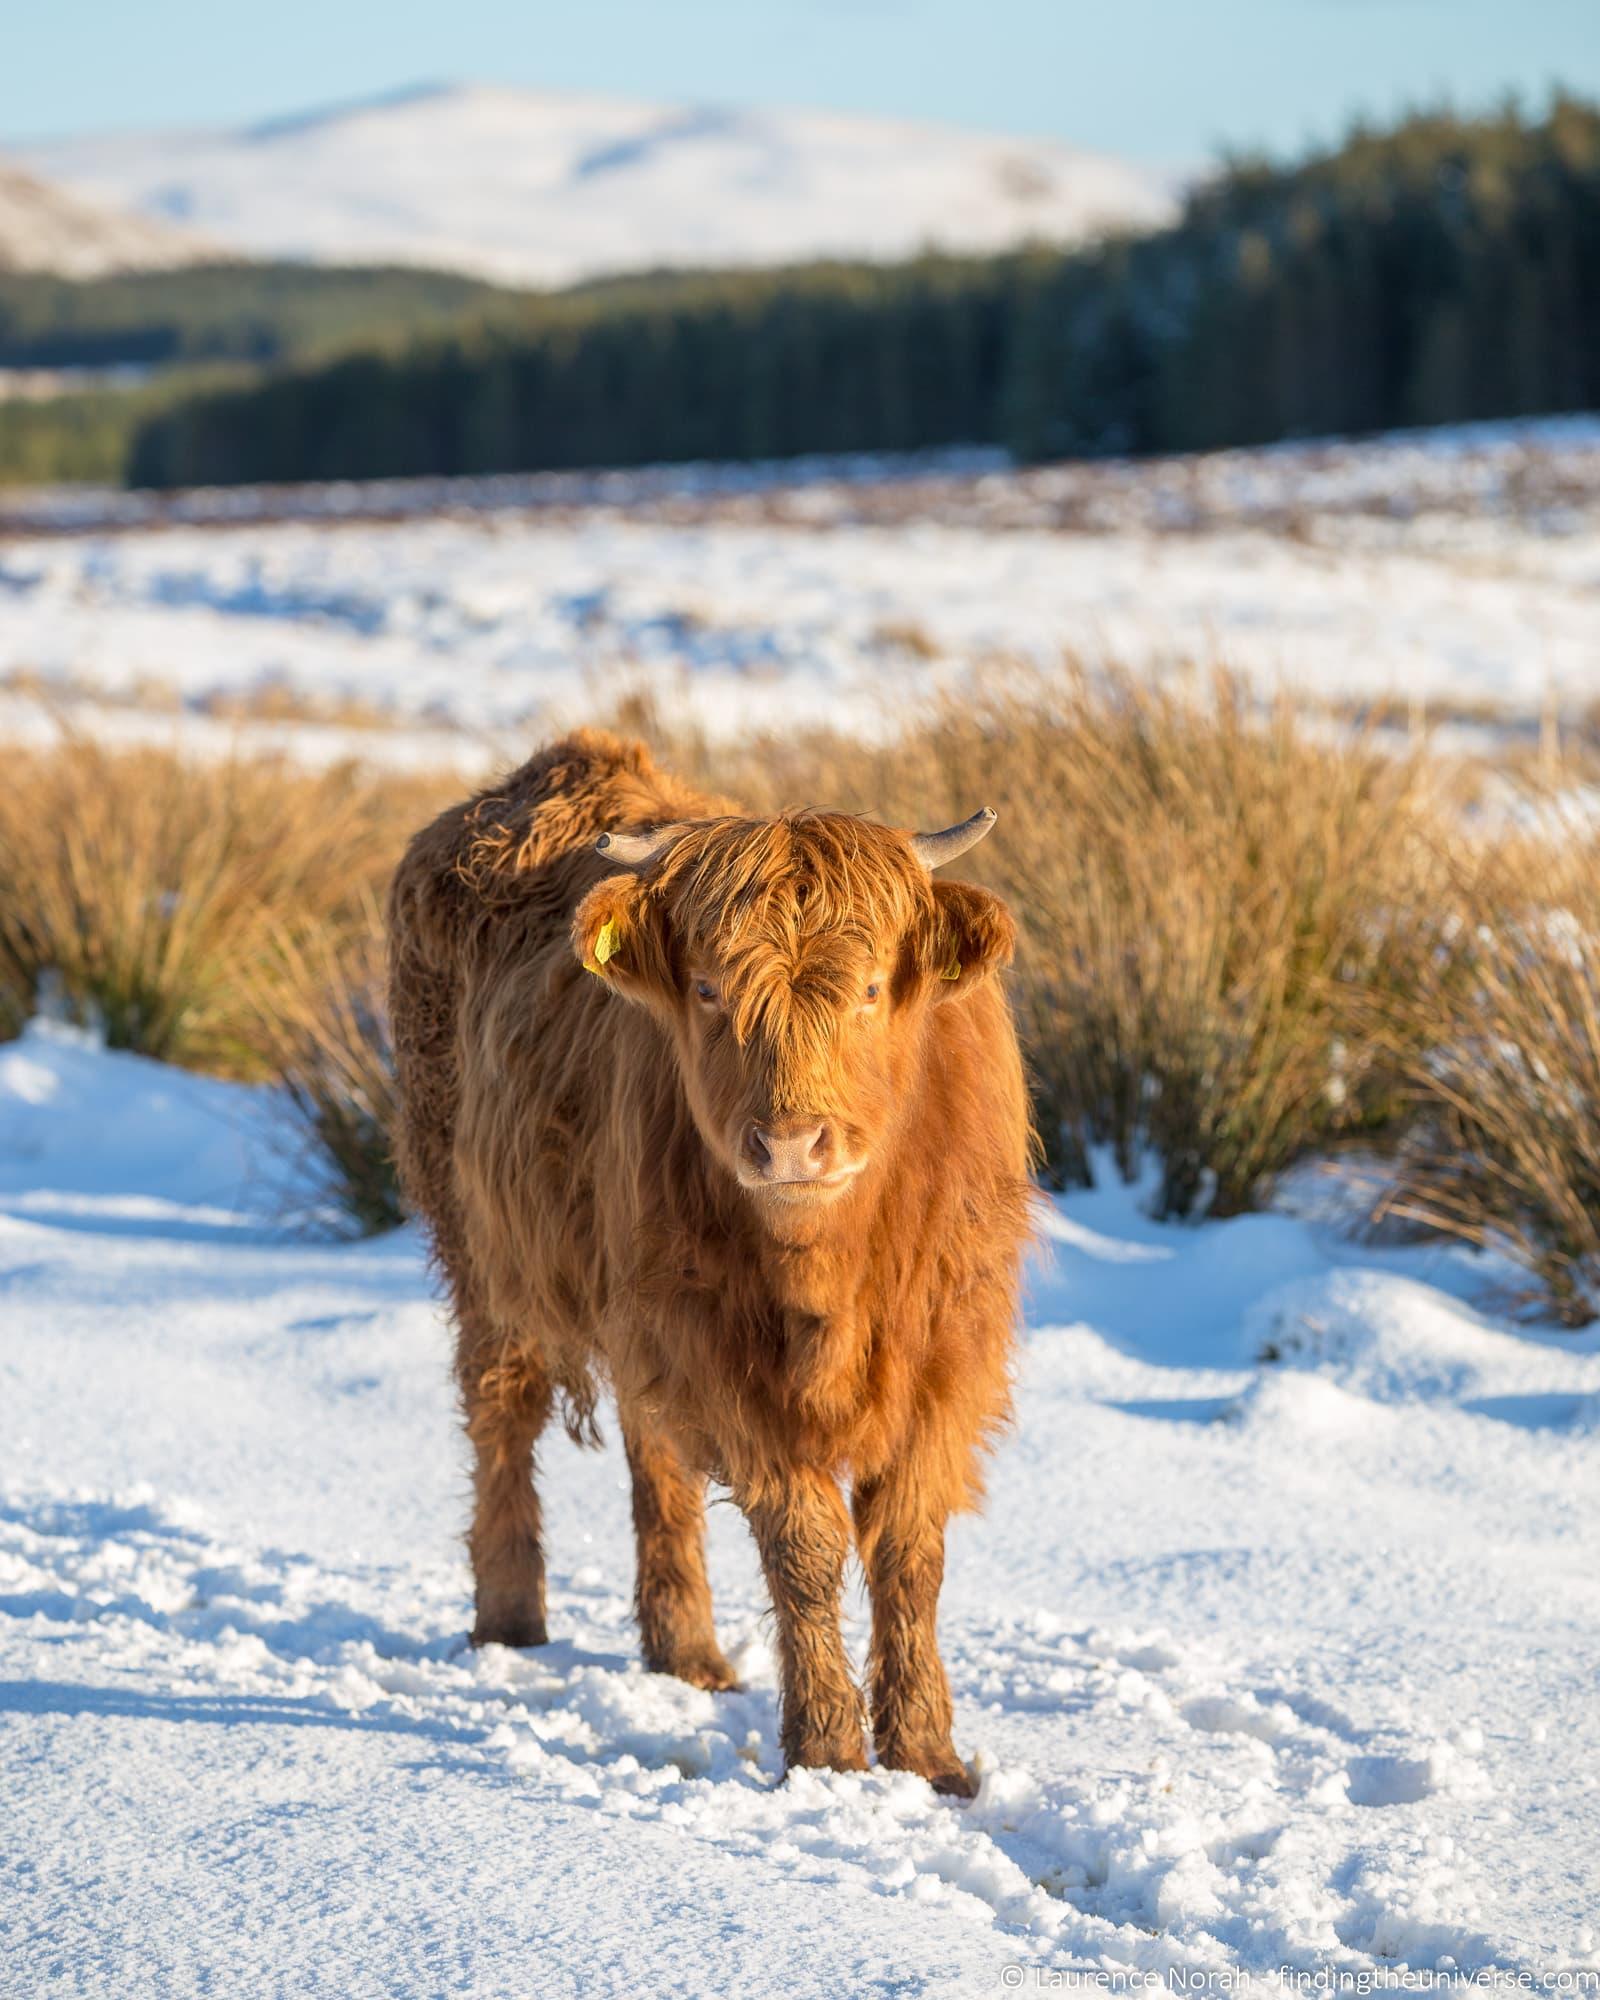 Snowy highland coo